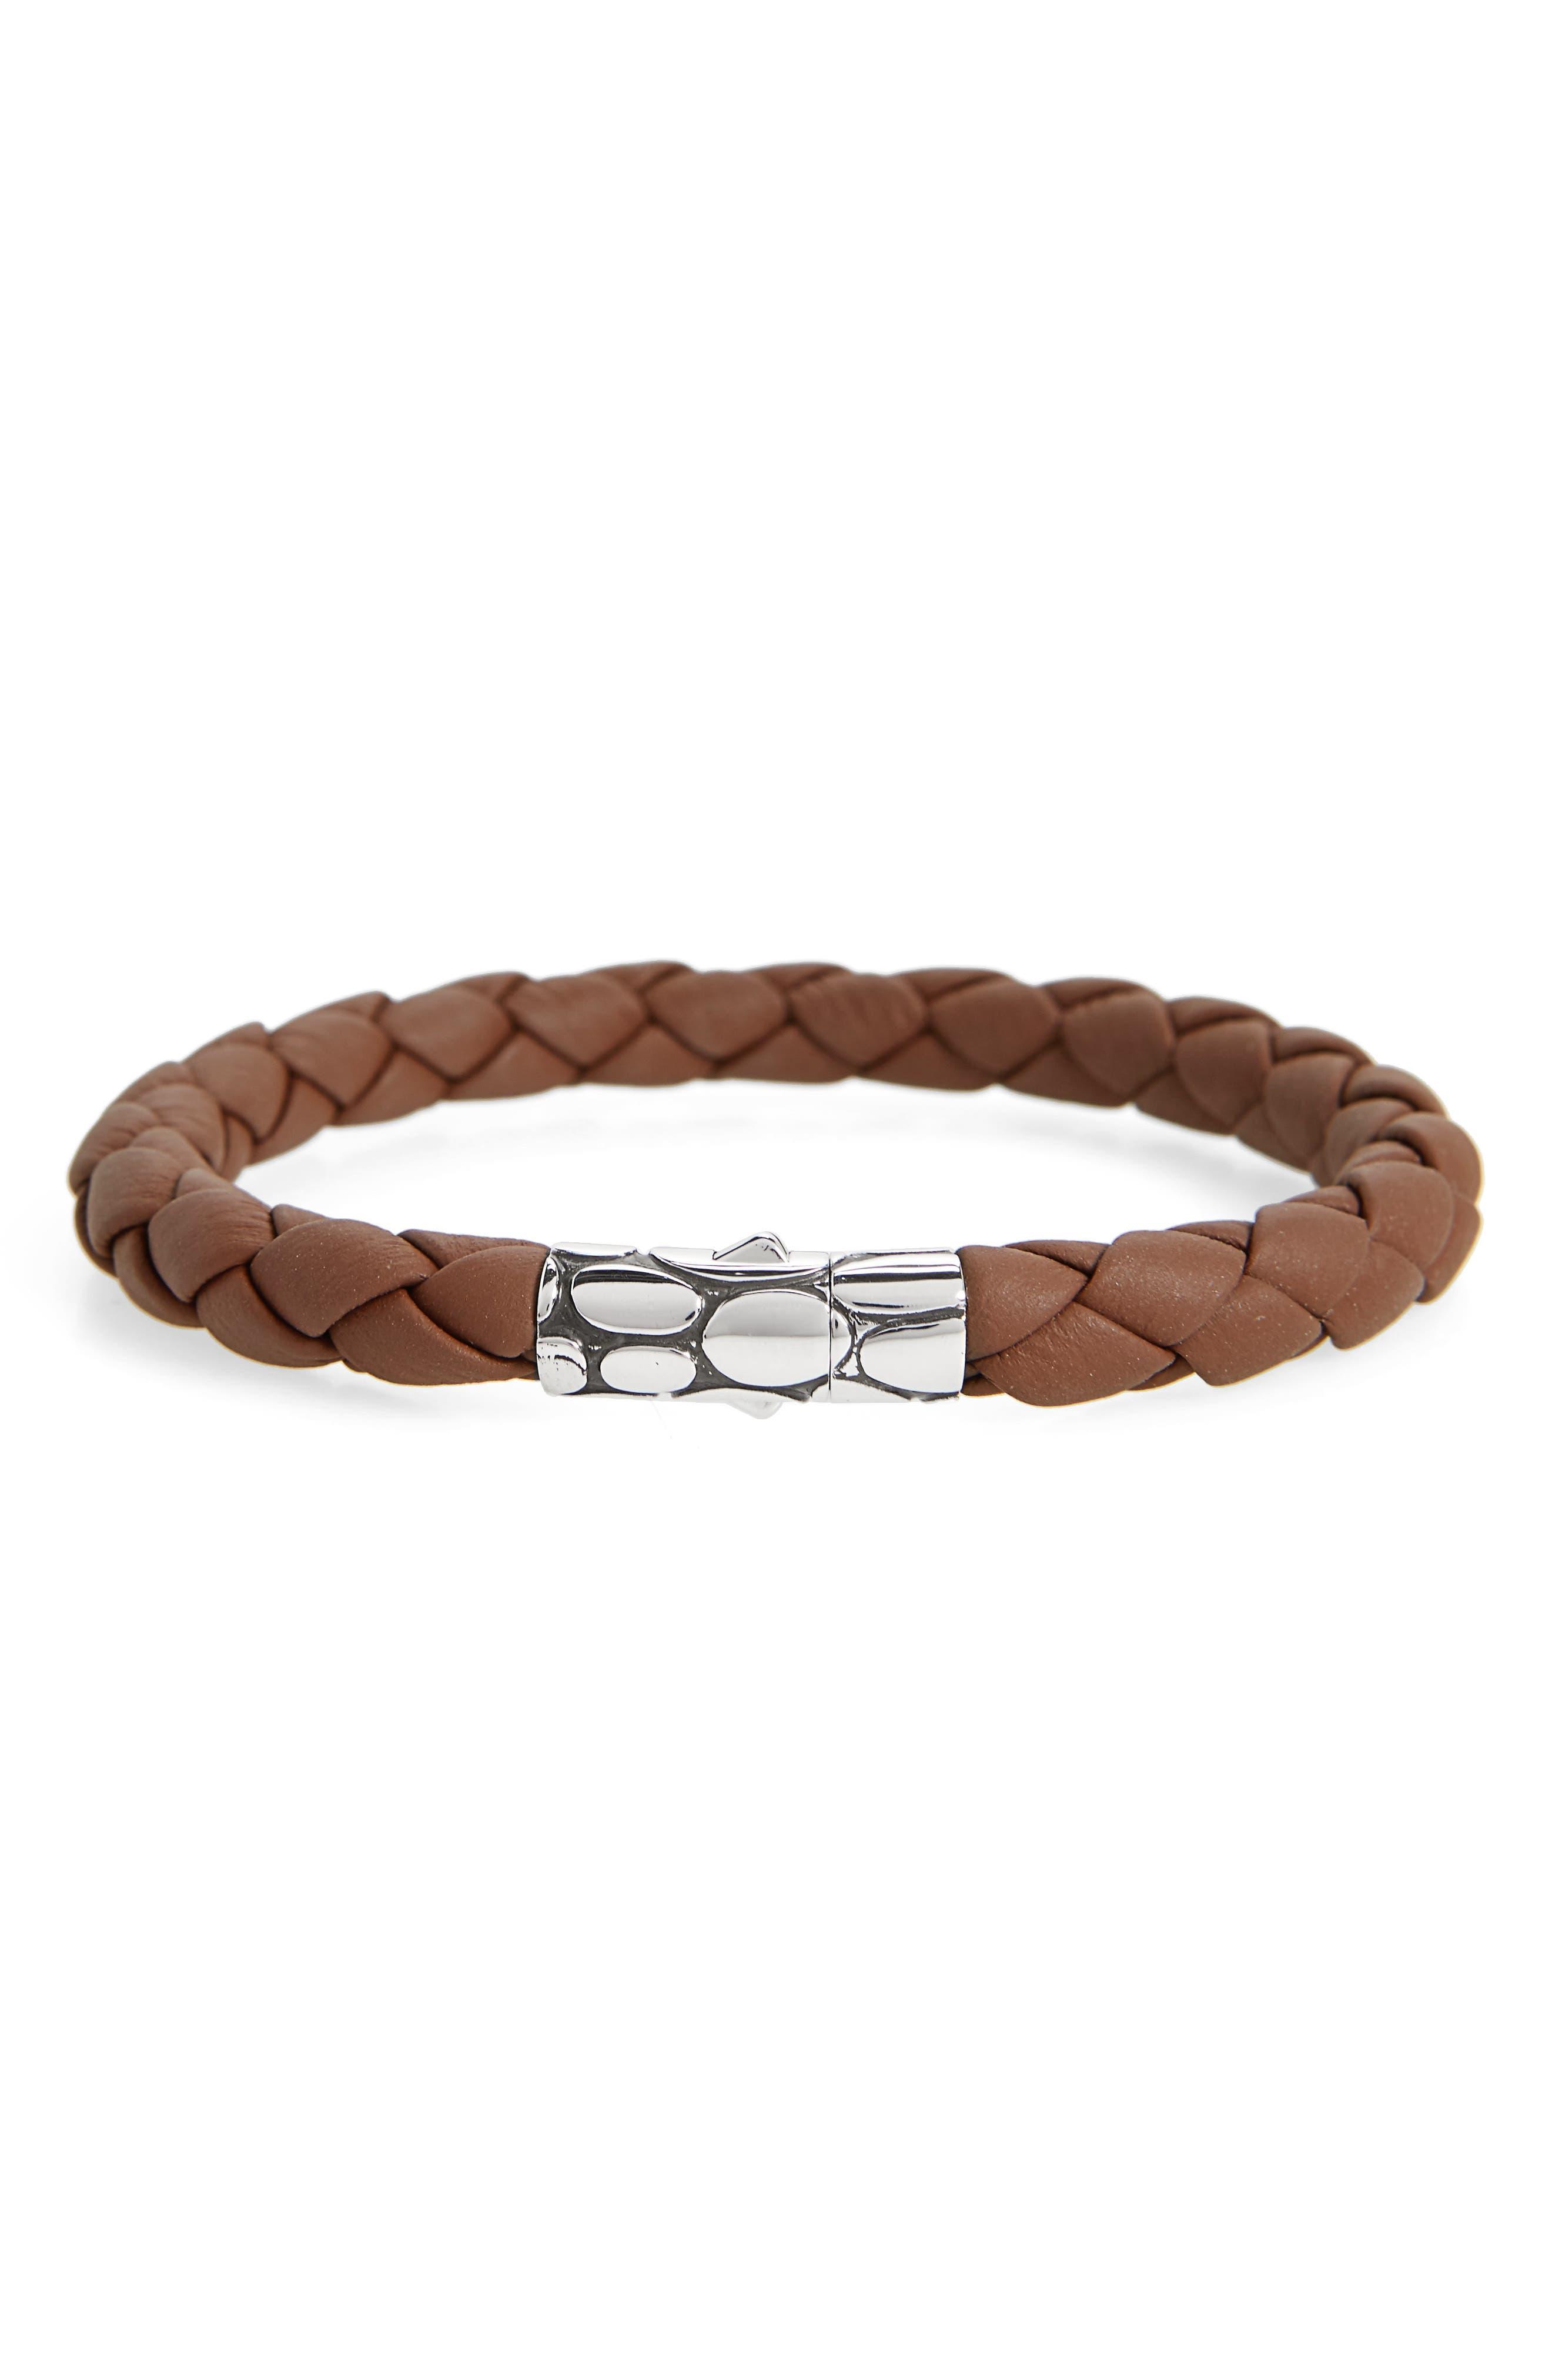 'Kali' Leather Bracelet,                         Main,                         color, SILVER/ BROWN